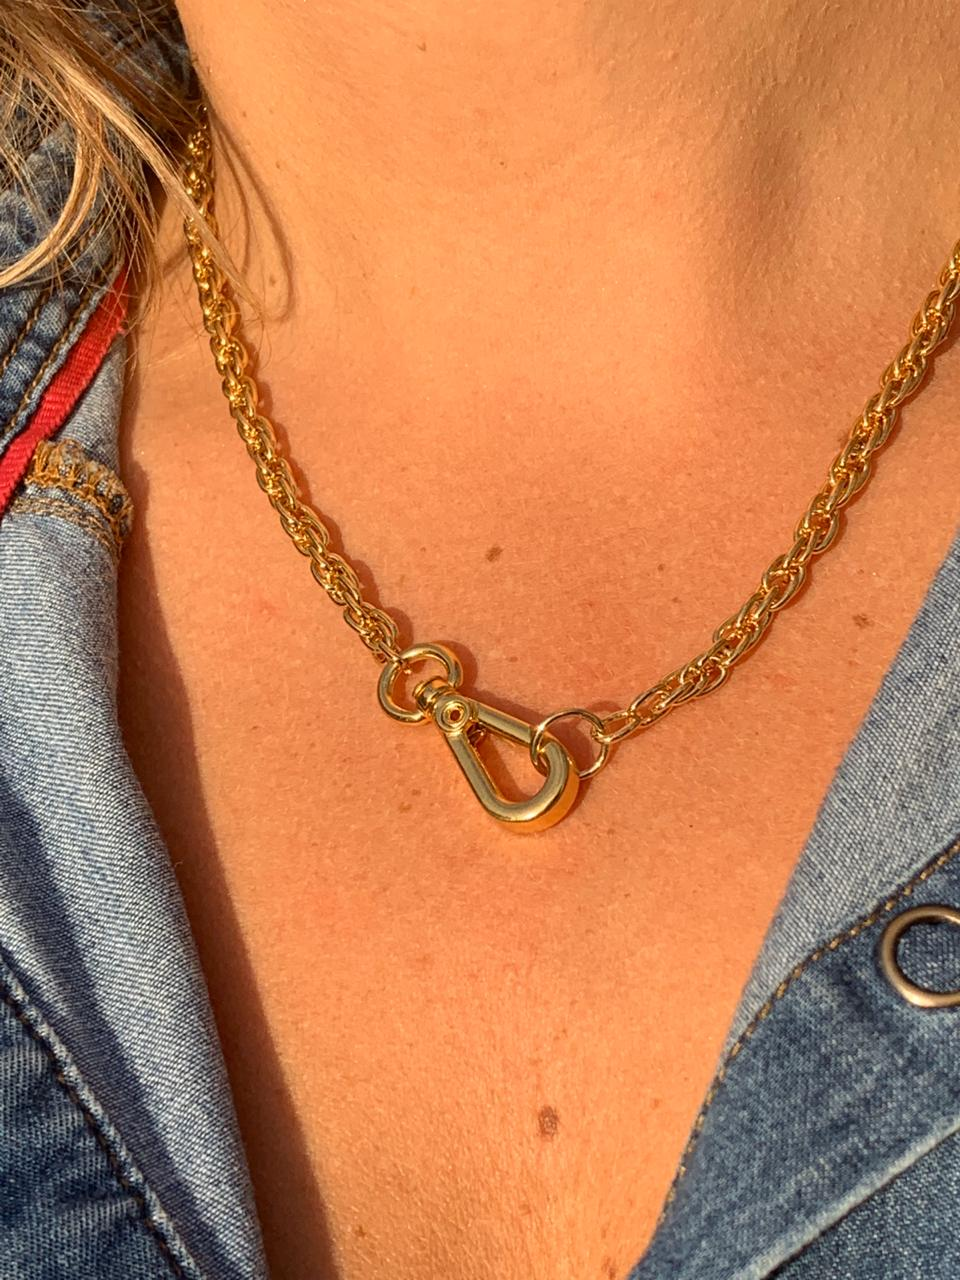 Colar artesanal corrente dourada fecho frontal | CA1018